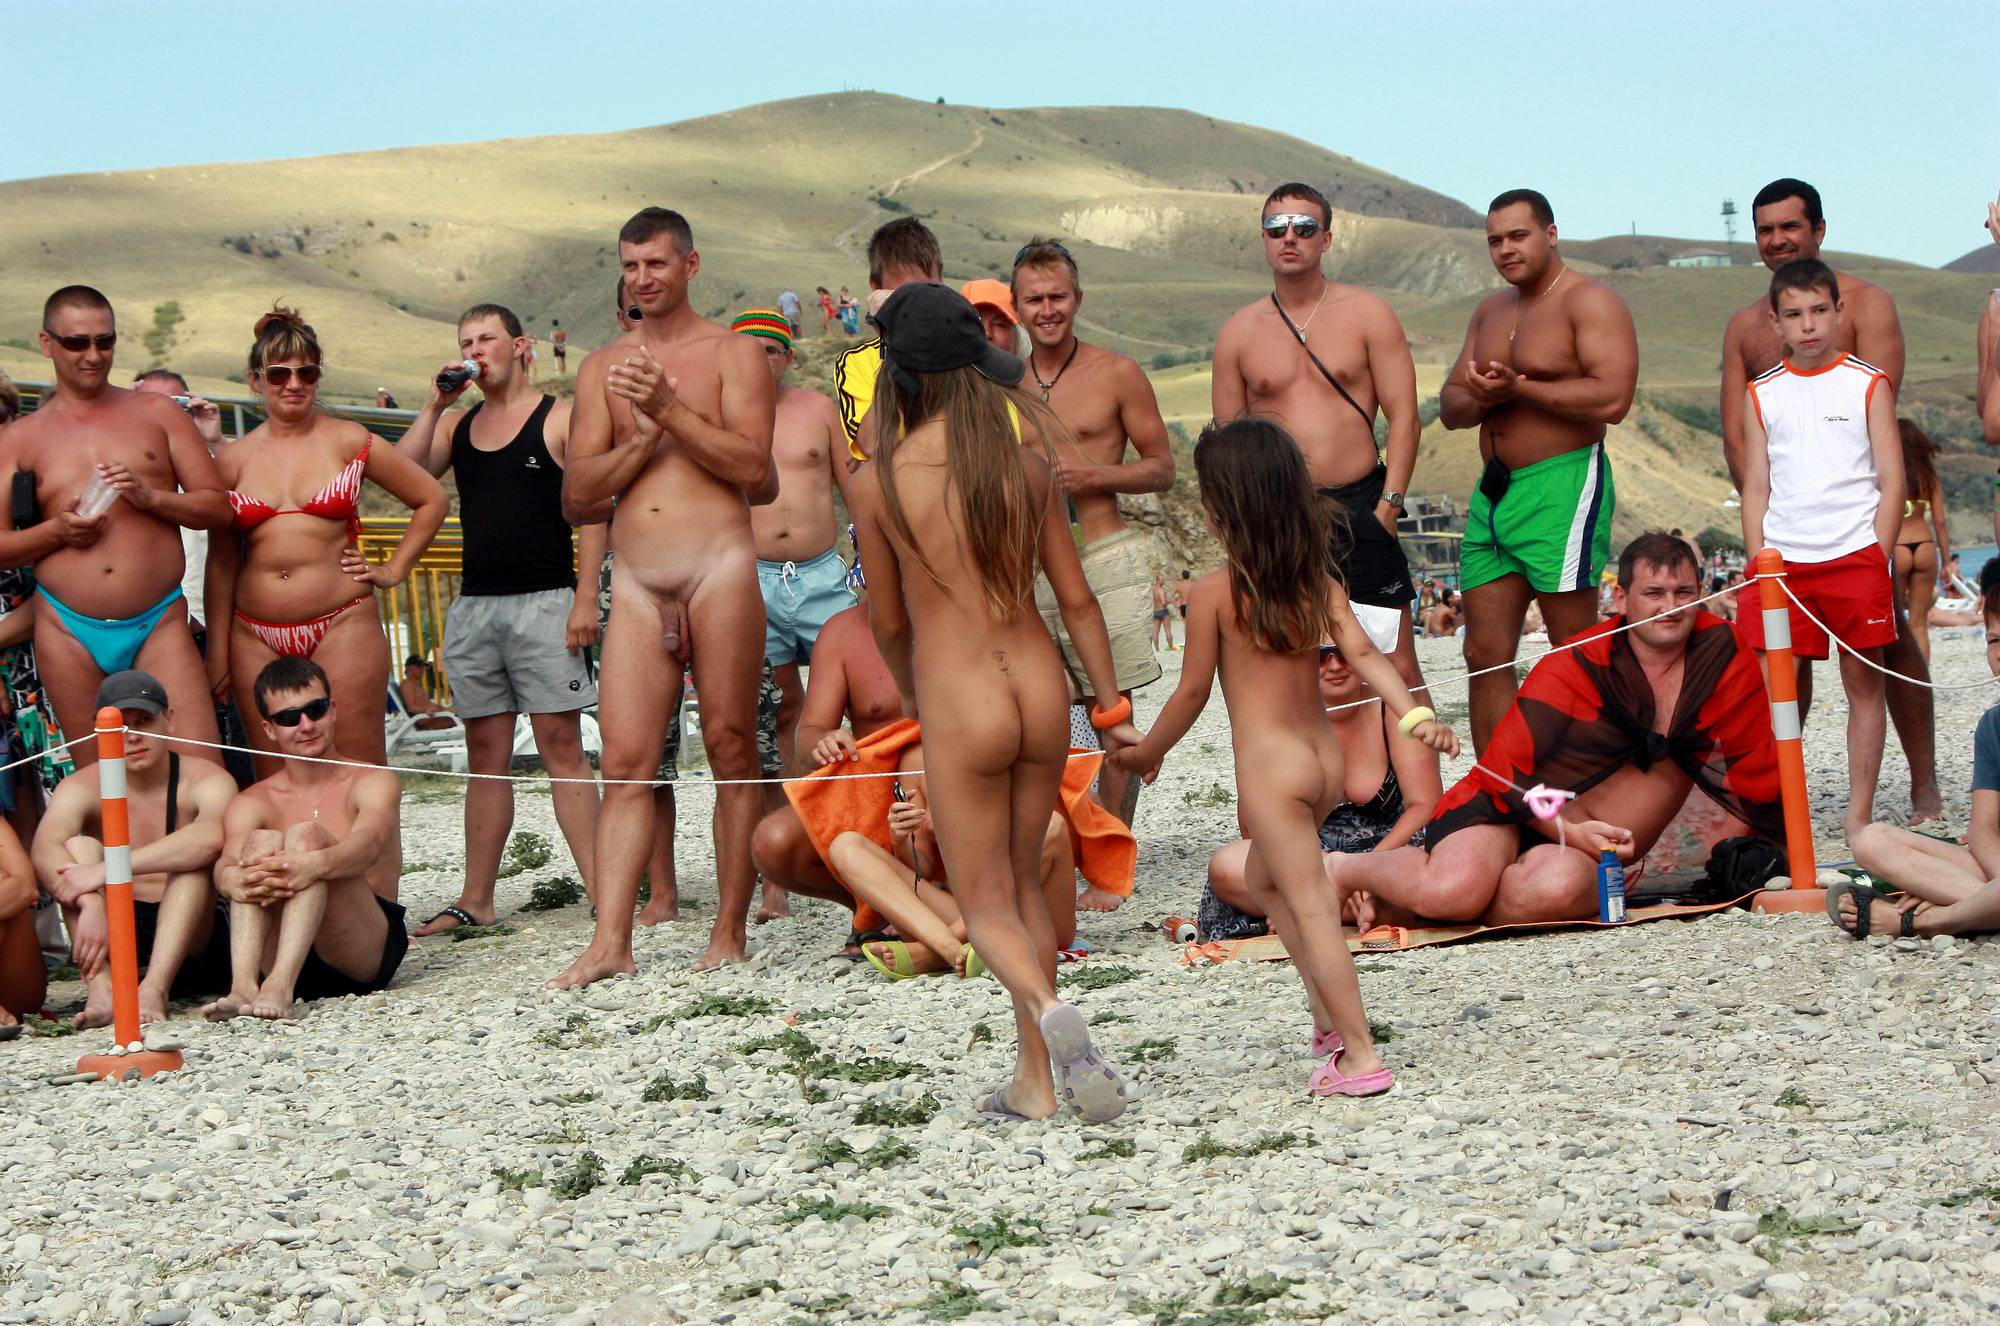 Purenudism Photos Nudist Duet Girl Rundown - 1